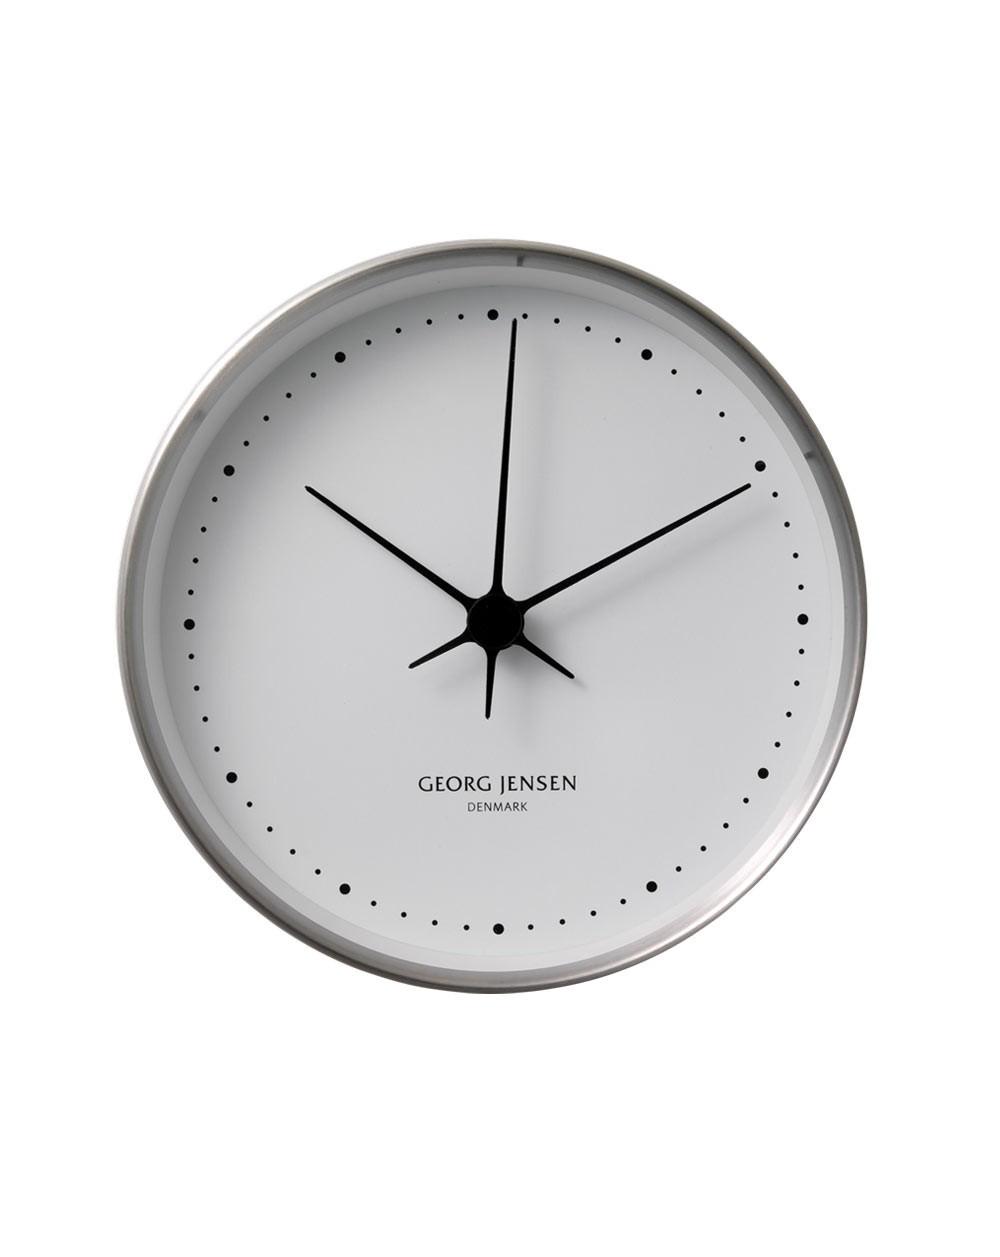 CADRANS KOPPEL ( horloge, thermomètre, hydromètre, baromètre )